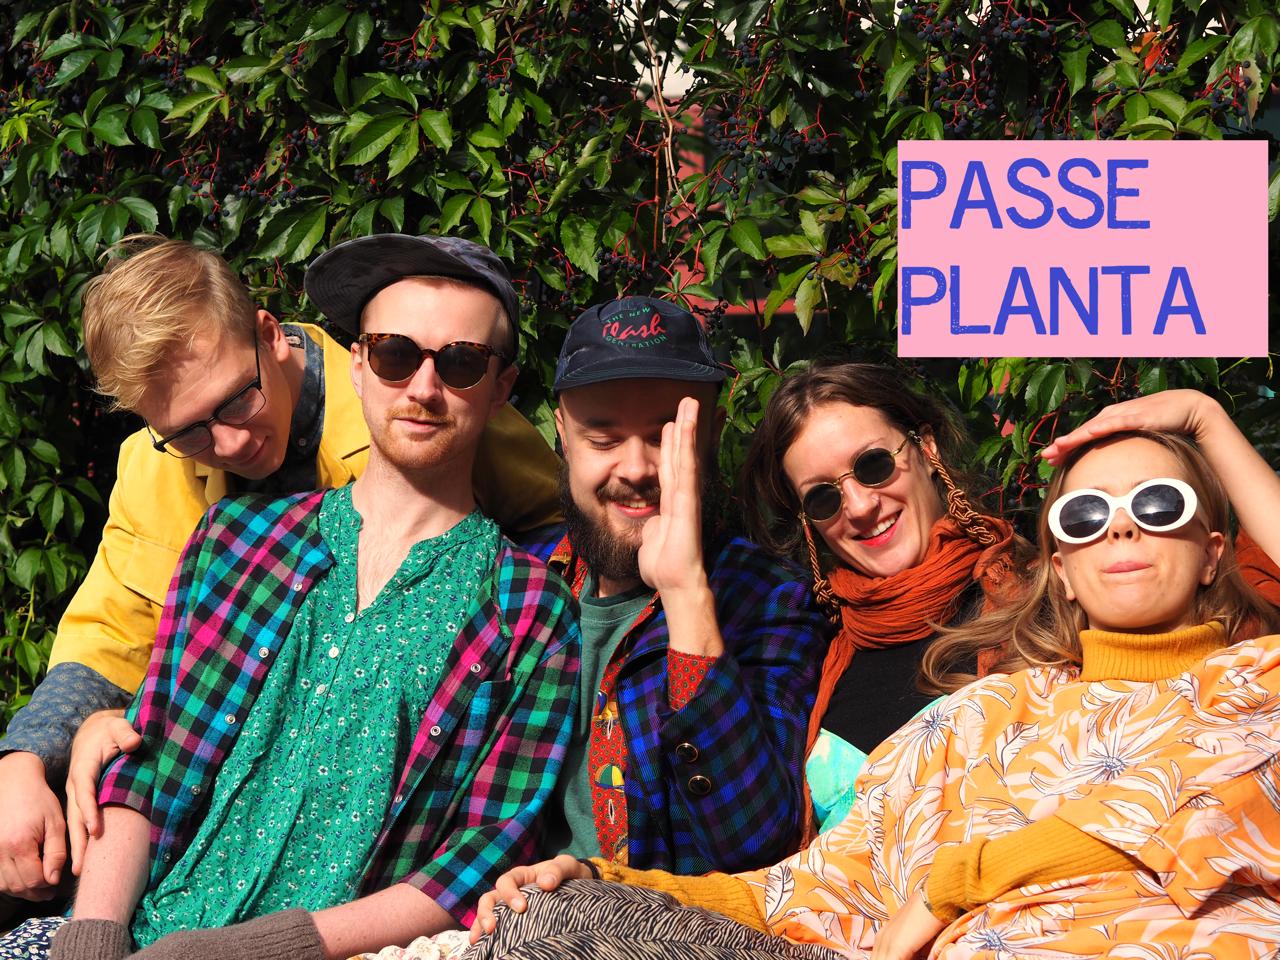 Passe Planta